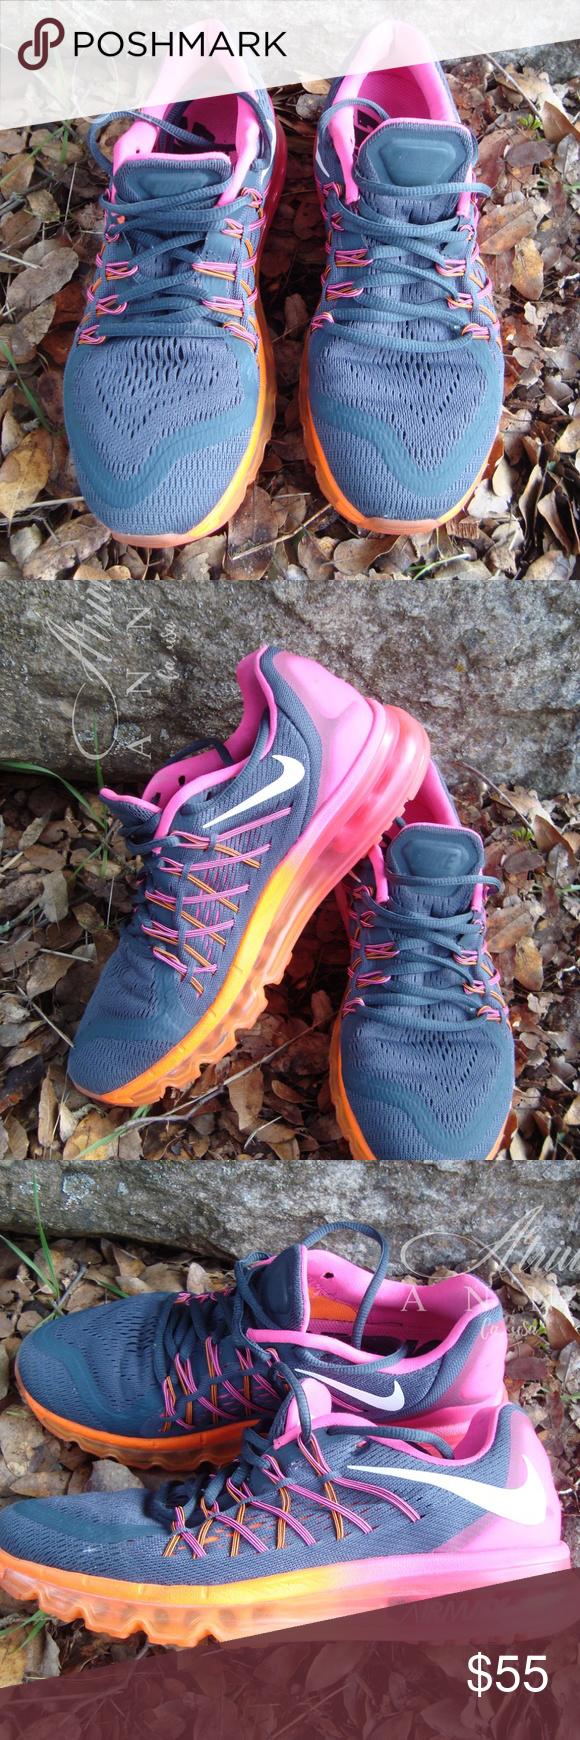 quality design de796 8662d Nike Air Max Multicolor Running Shoes, 8.5 Nike Air Max Neutral Ride Soft  Woman Multicolor